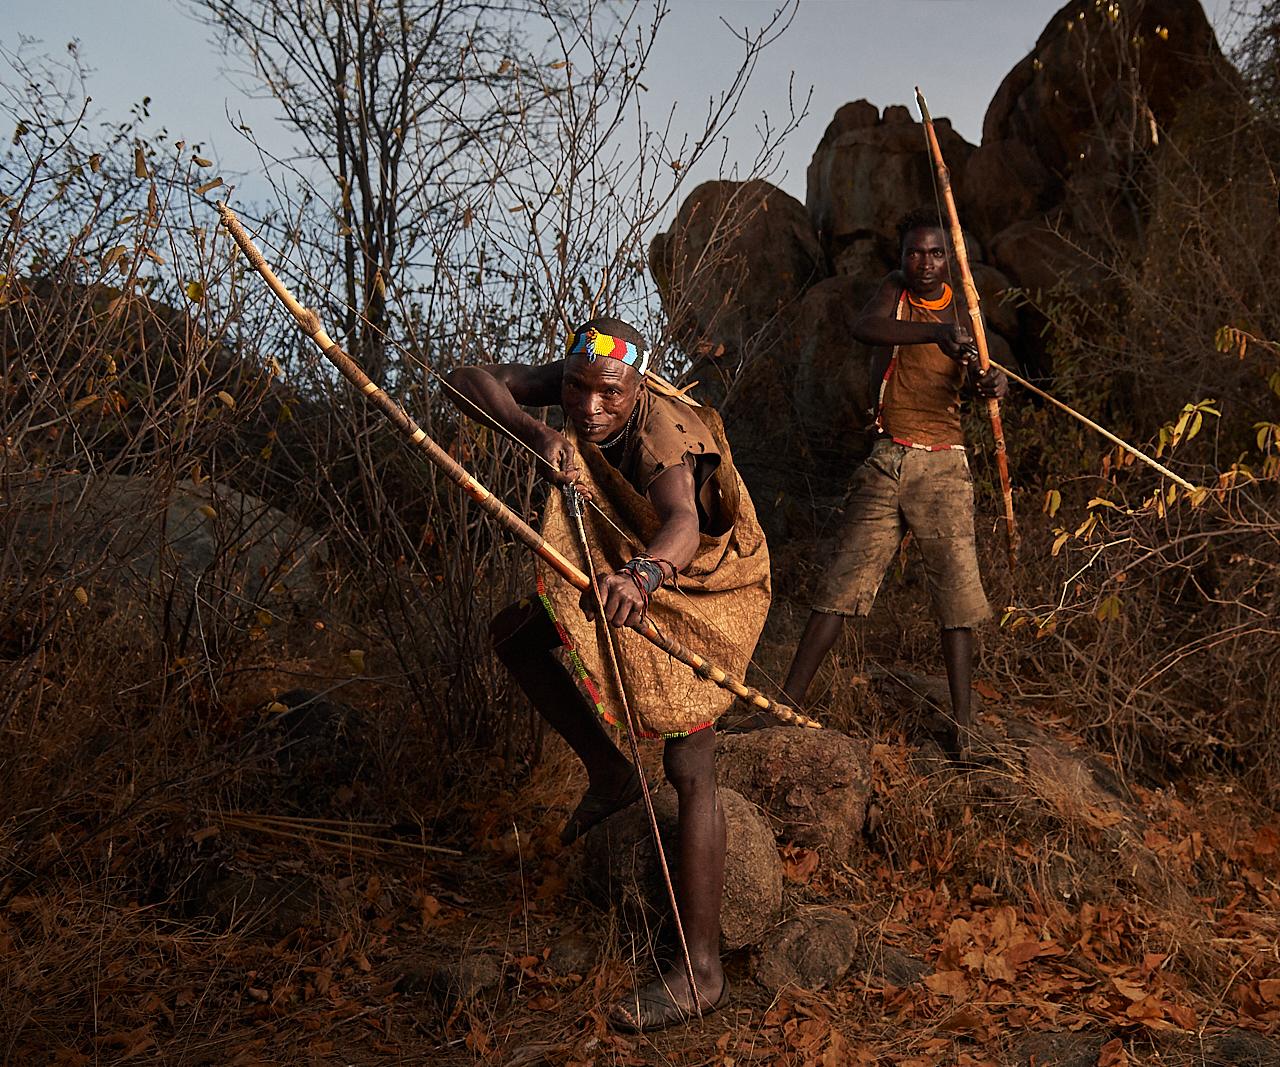 Hazabe hunters